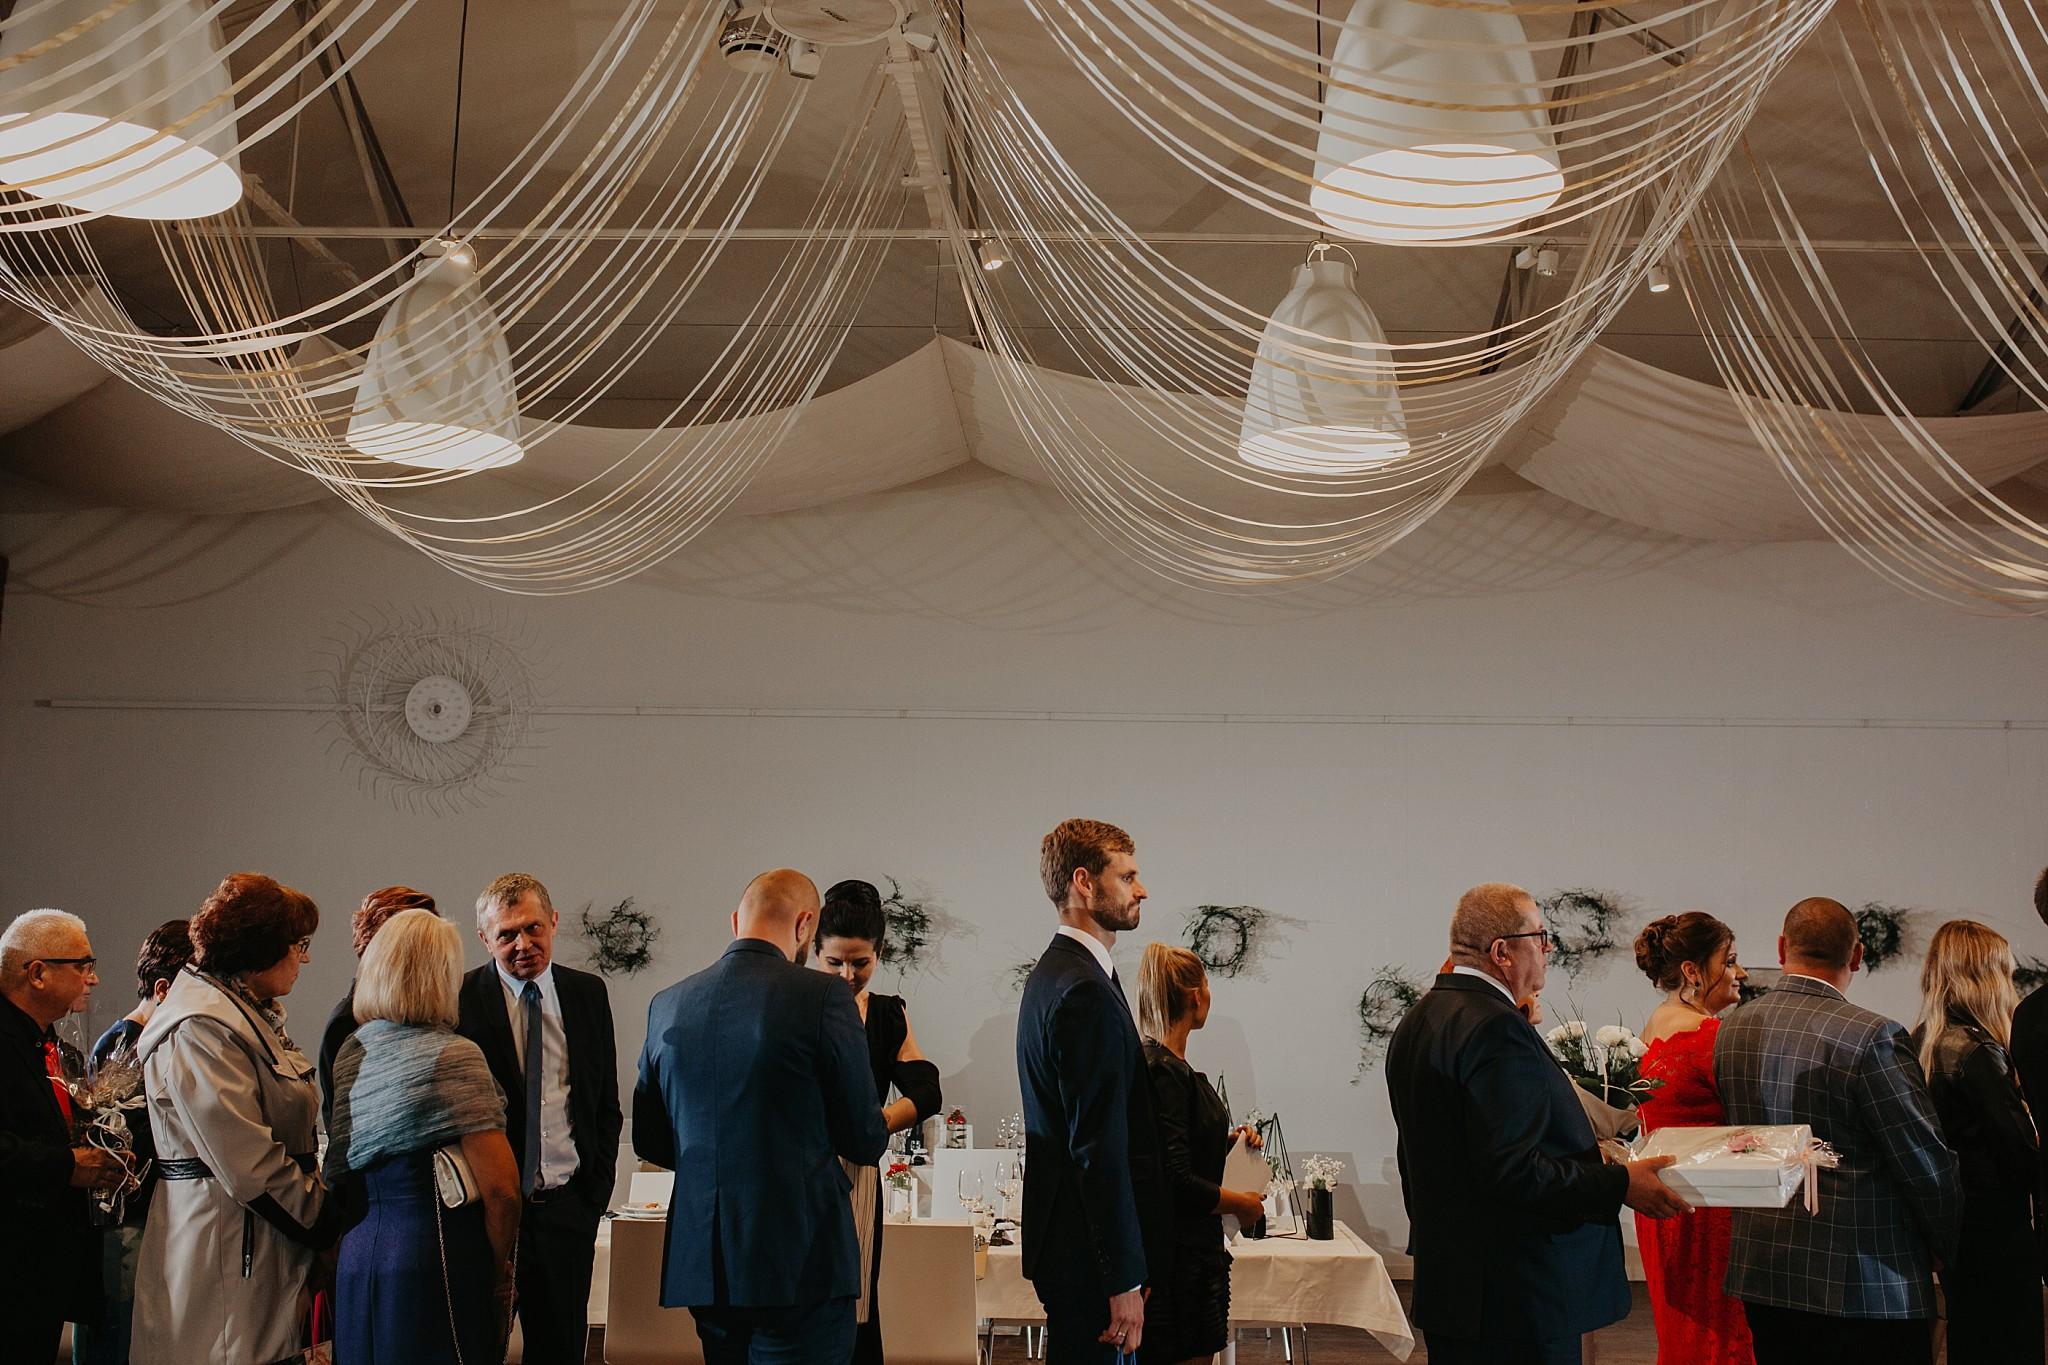 fotograf poznan wesele dobra truskawka piekne wesele pod poznaniem wesele w dobrej truskawce piekna para mloda slub marzen slub koronawirus slub listopad wesele koronawirus 273